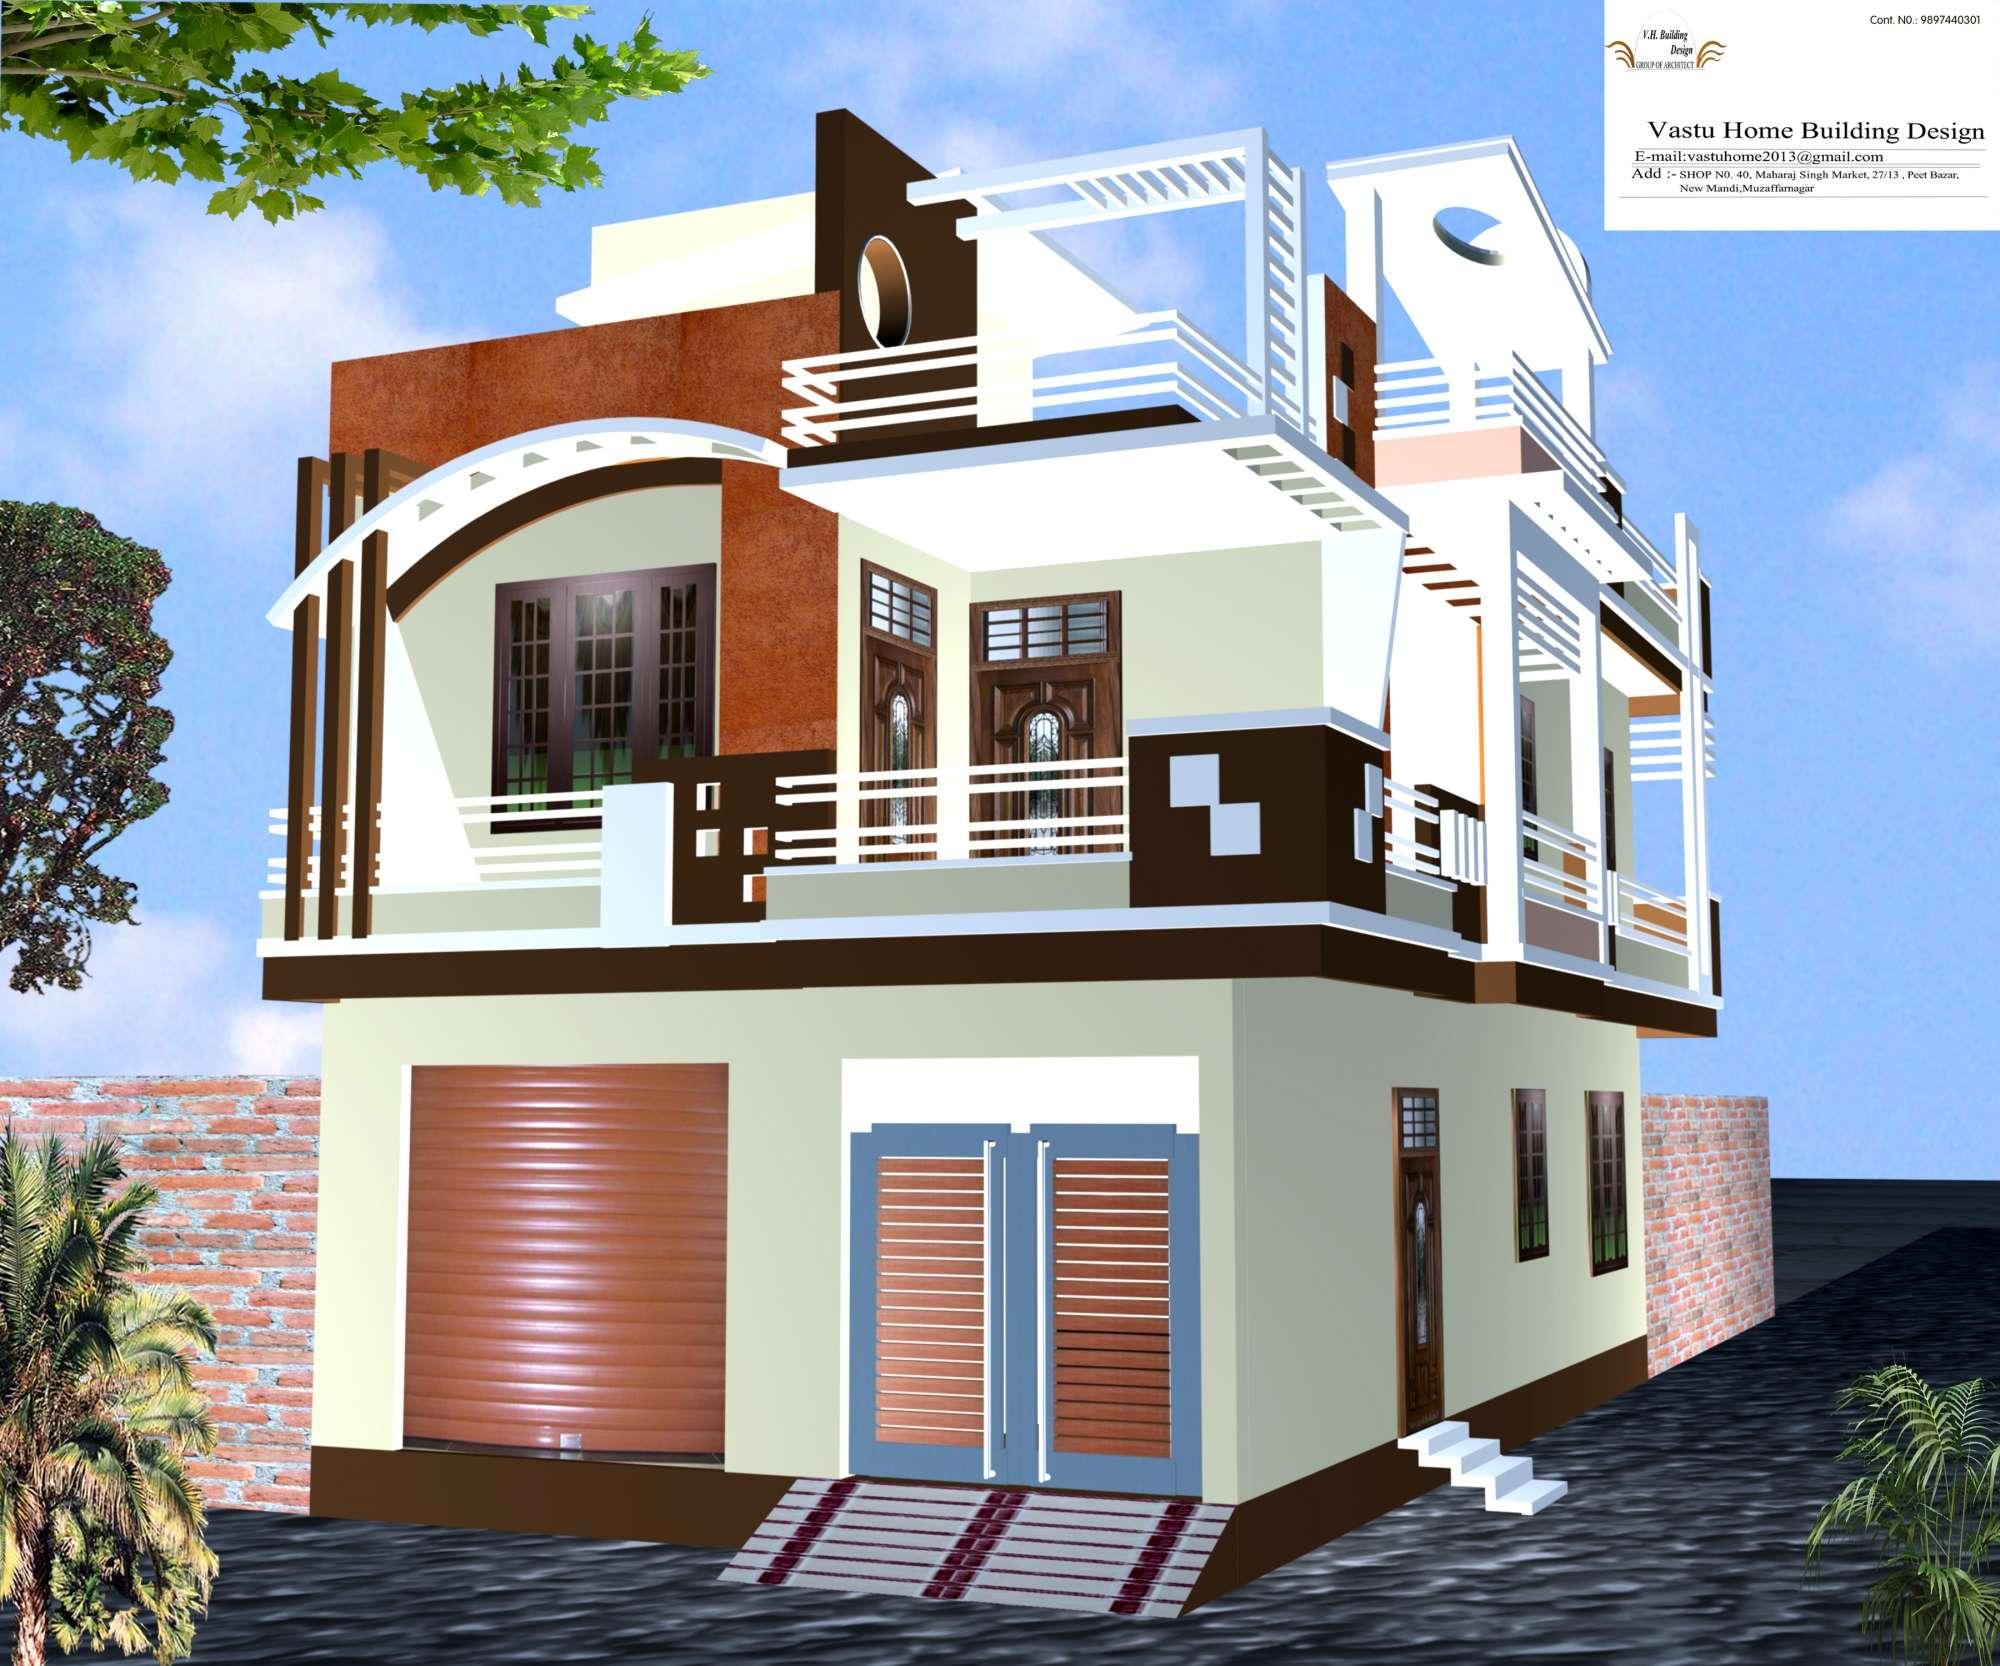 Architect design - Vastu Home Building Design Photos, Muzaffar Nagar  City, Muzaffarnagar - Architects